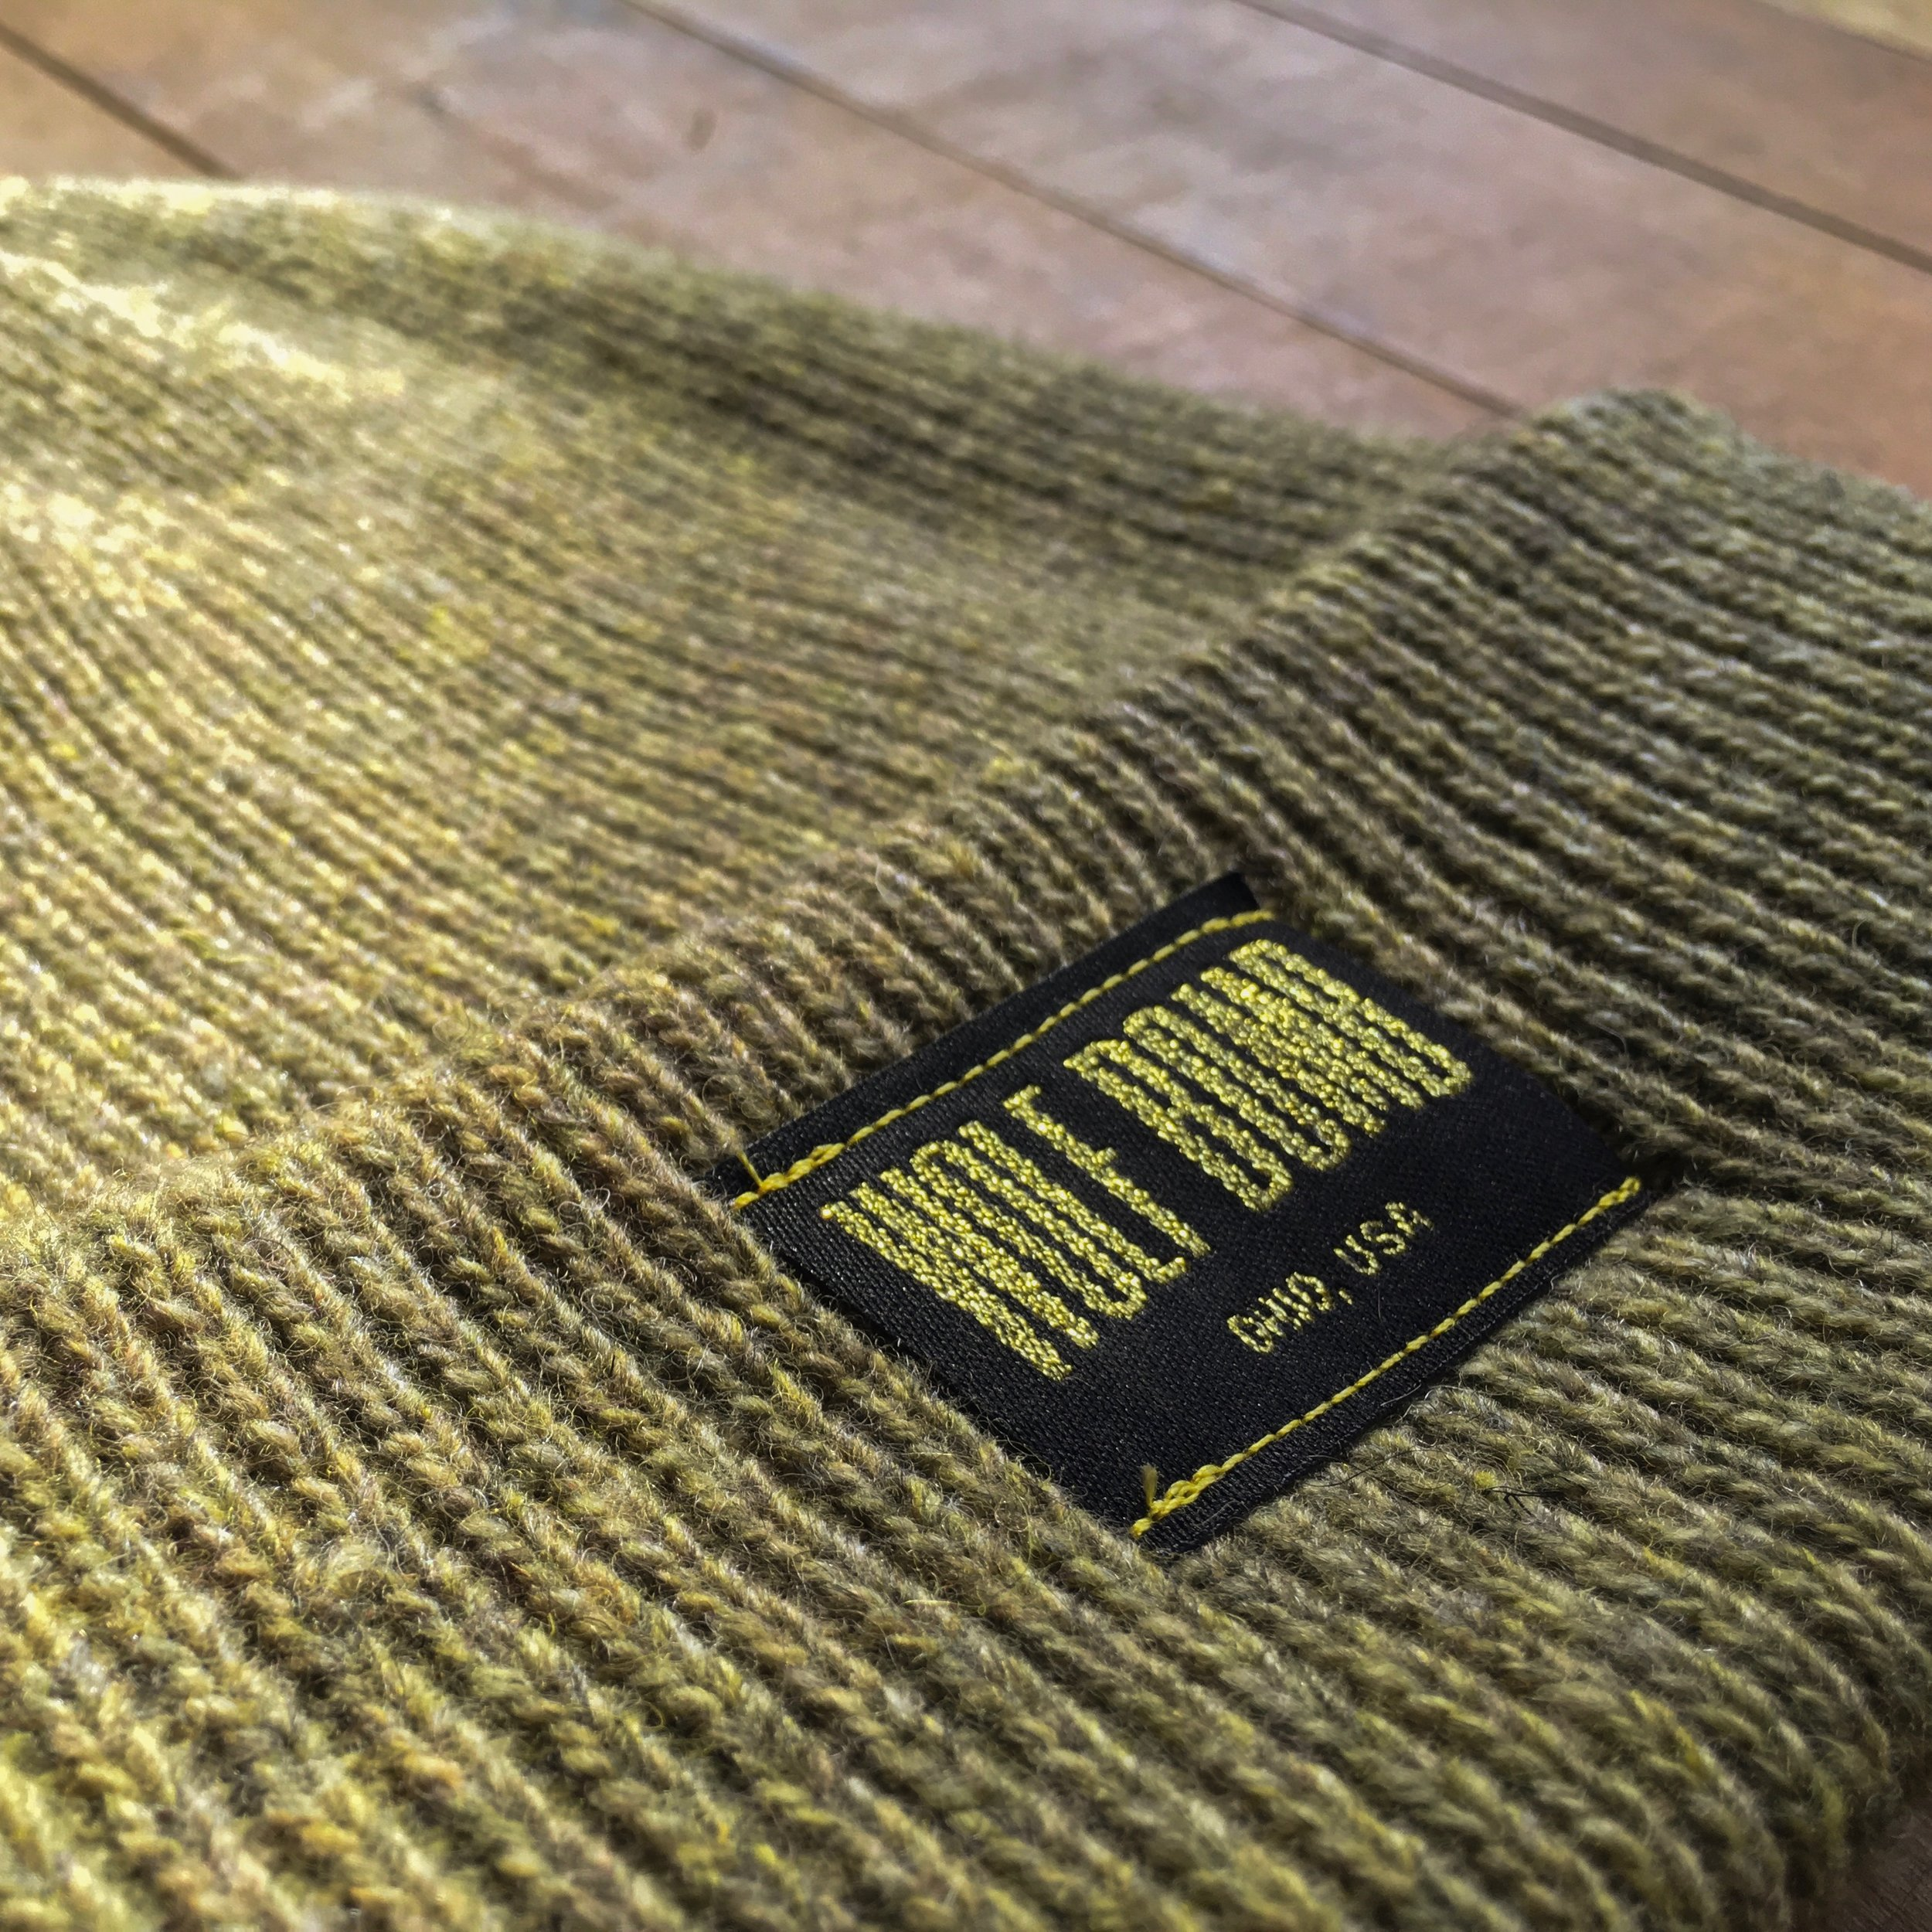 wb hat2.JPG